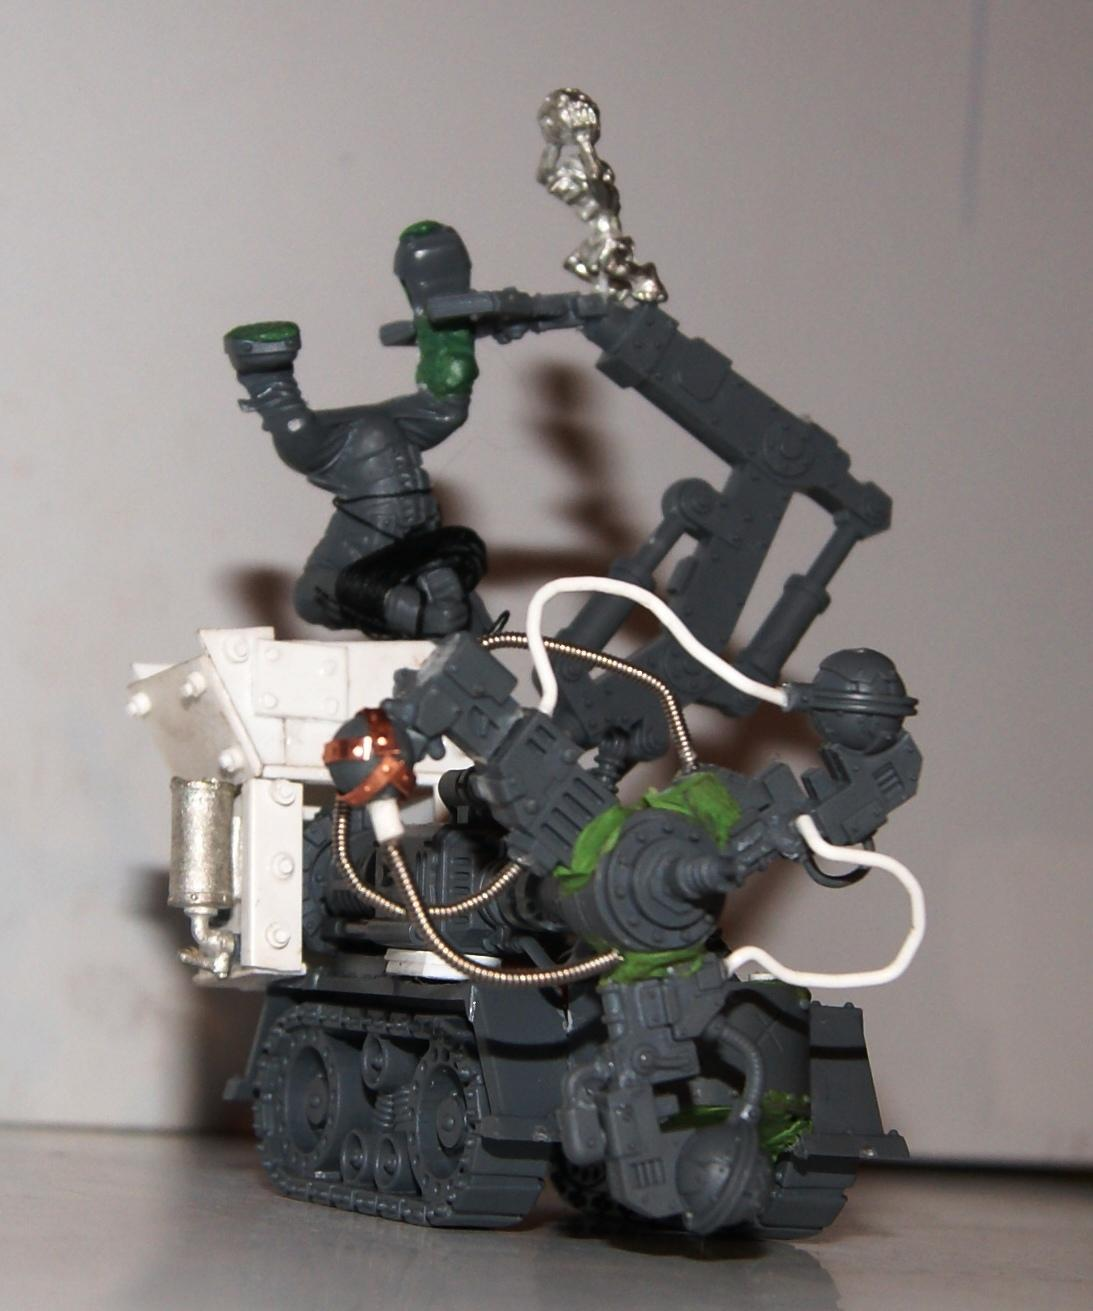 Conversion, Grot Rebellion, Grot Rebels, Grots, Shokk Attak Gun, Warhammer 40,000